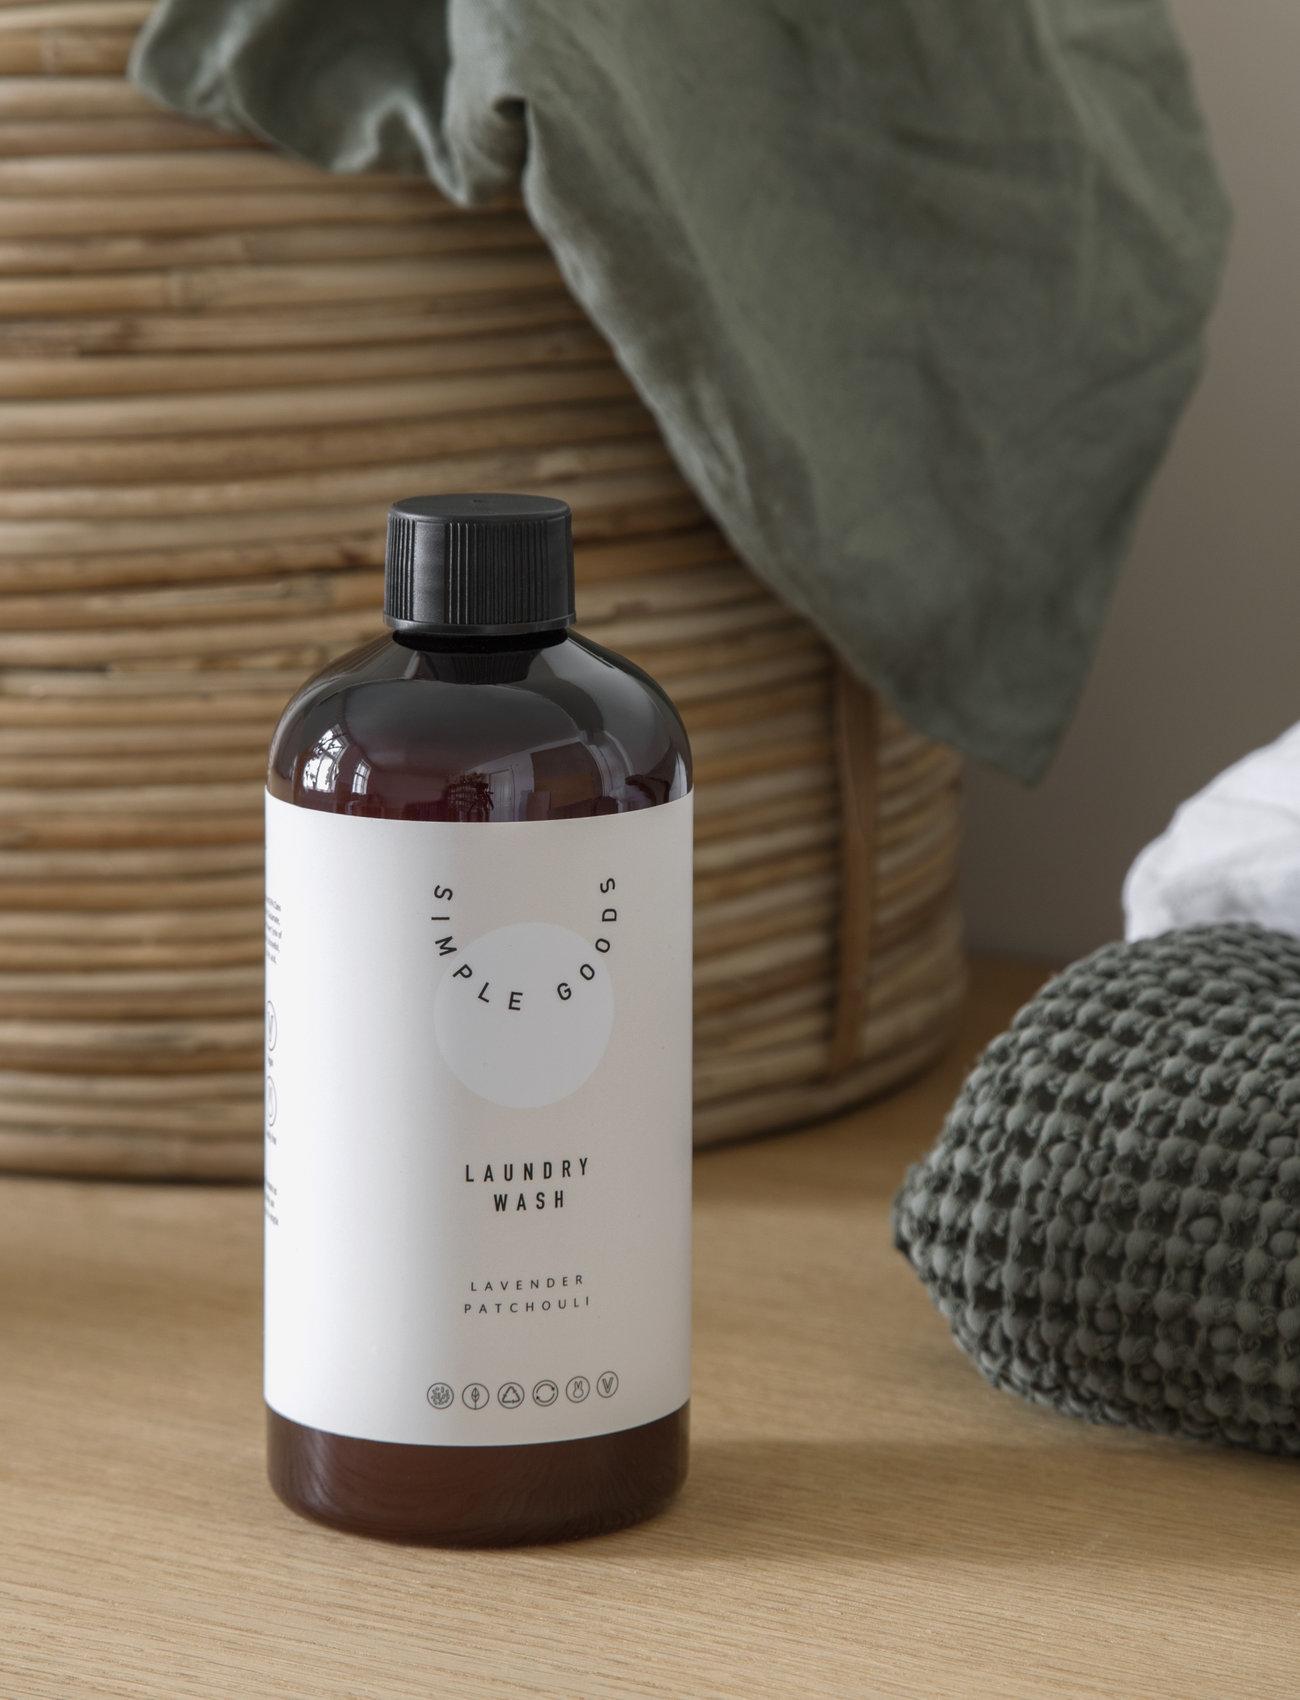 Simple Goods - Laundry Wash, Lavender, Paatchouli - Övrigt diskning & städning - clear - 1